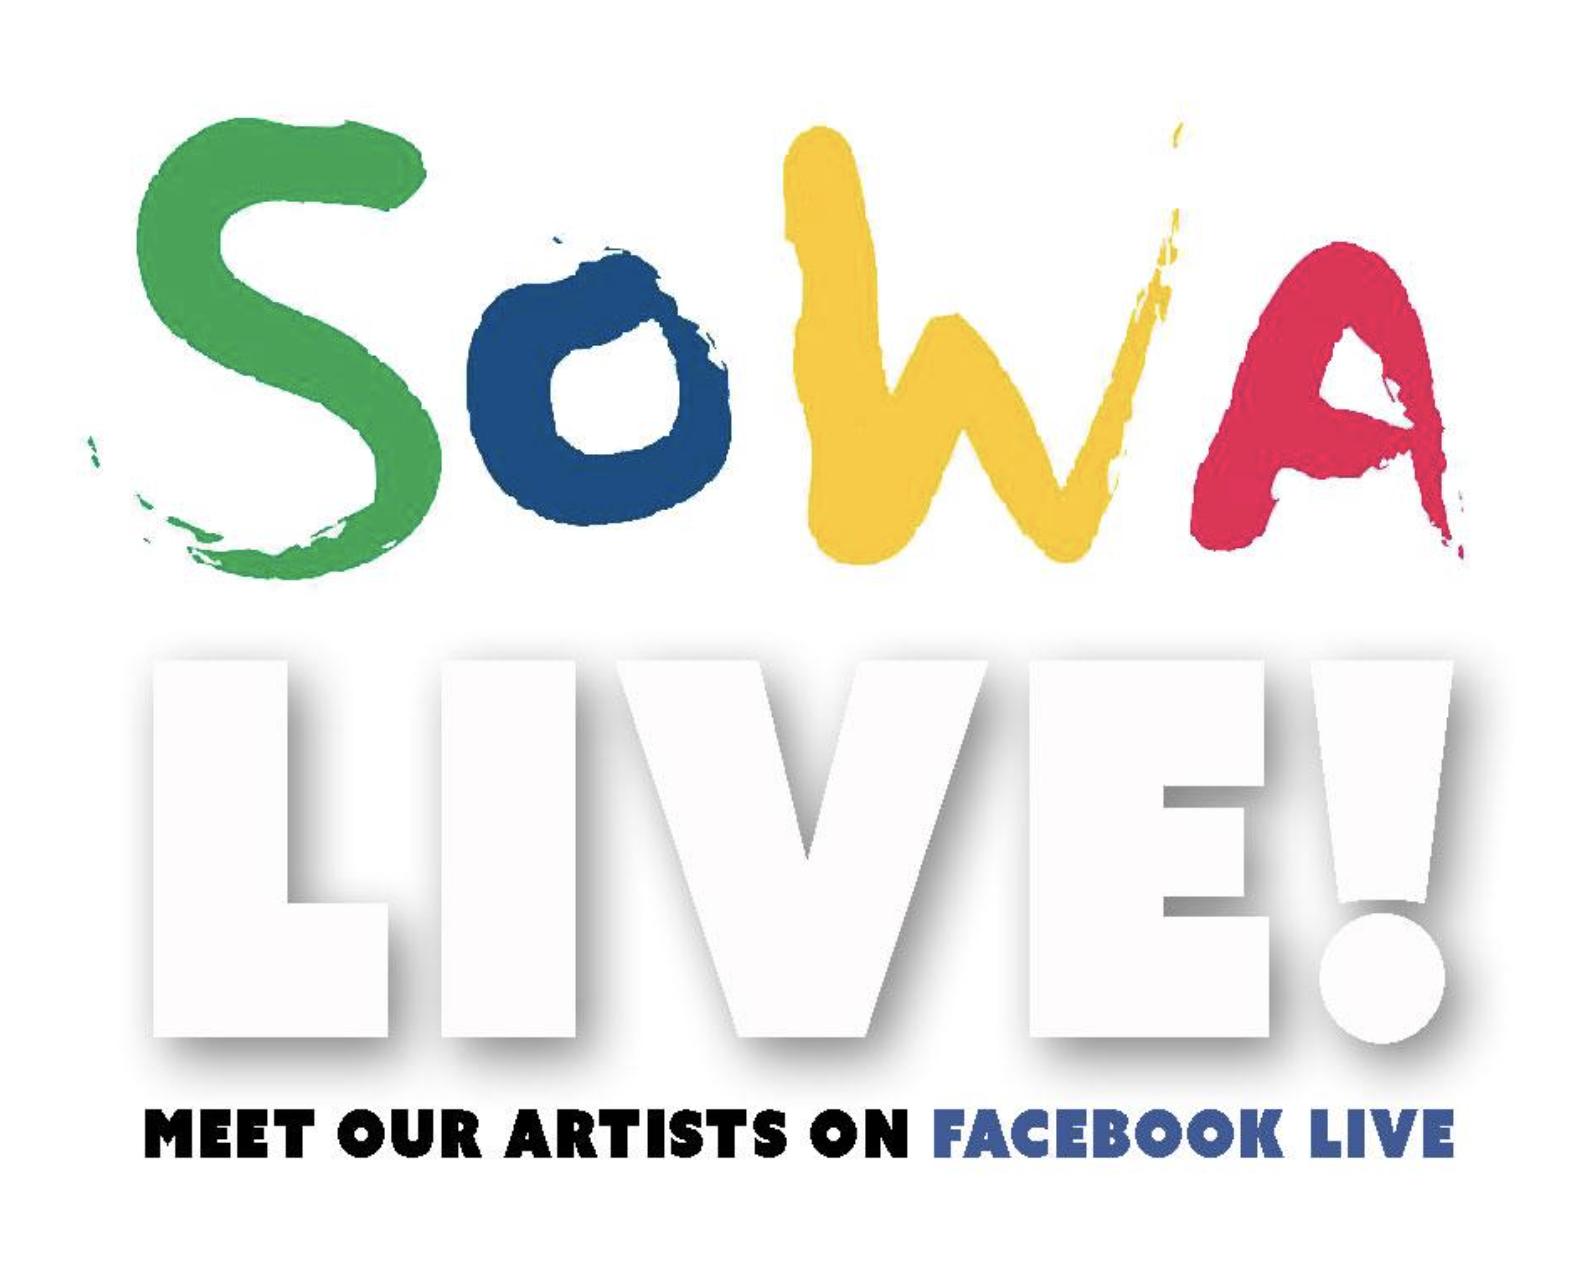 SoWa Live!